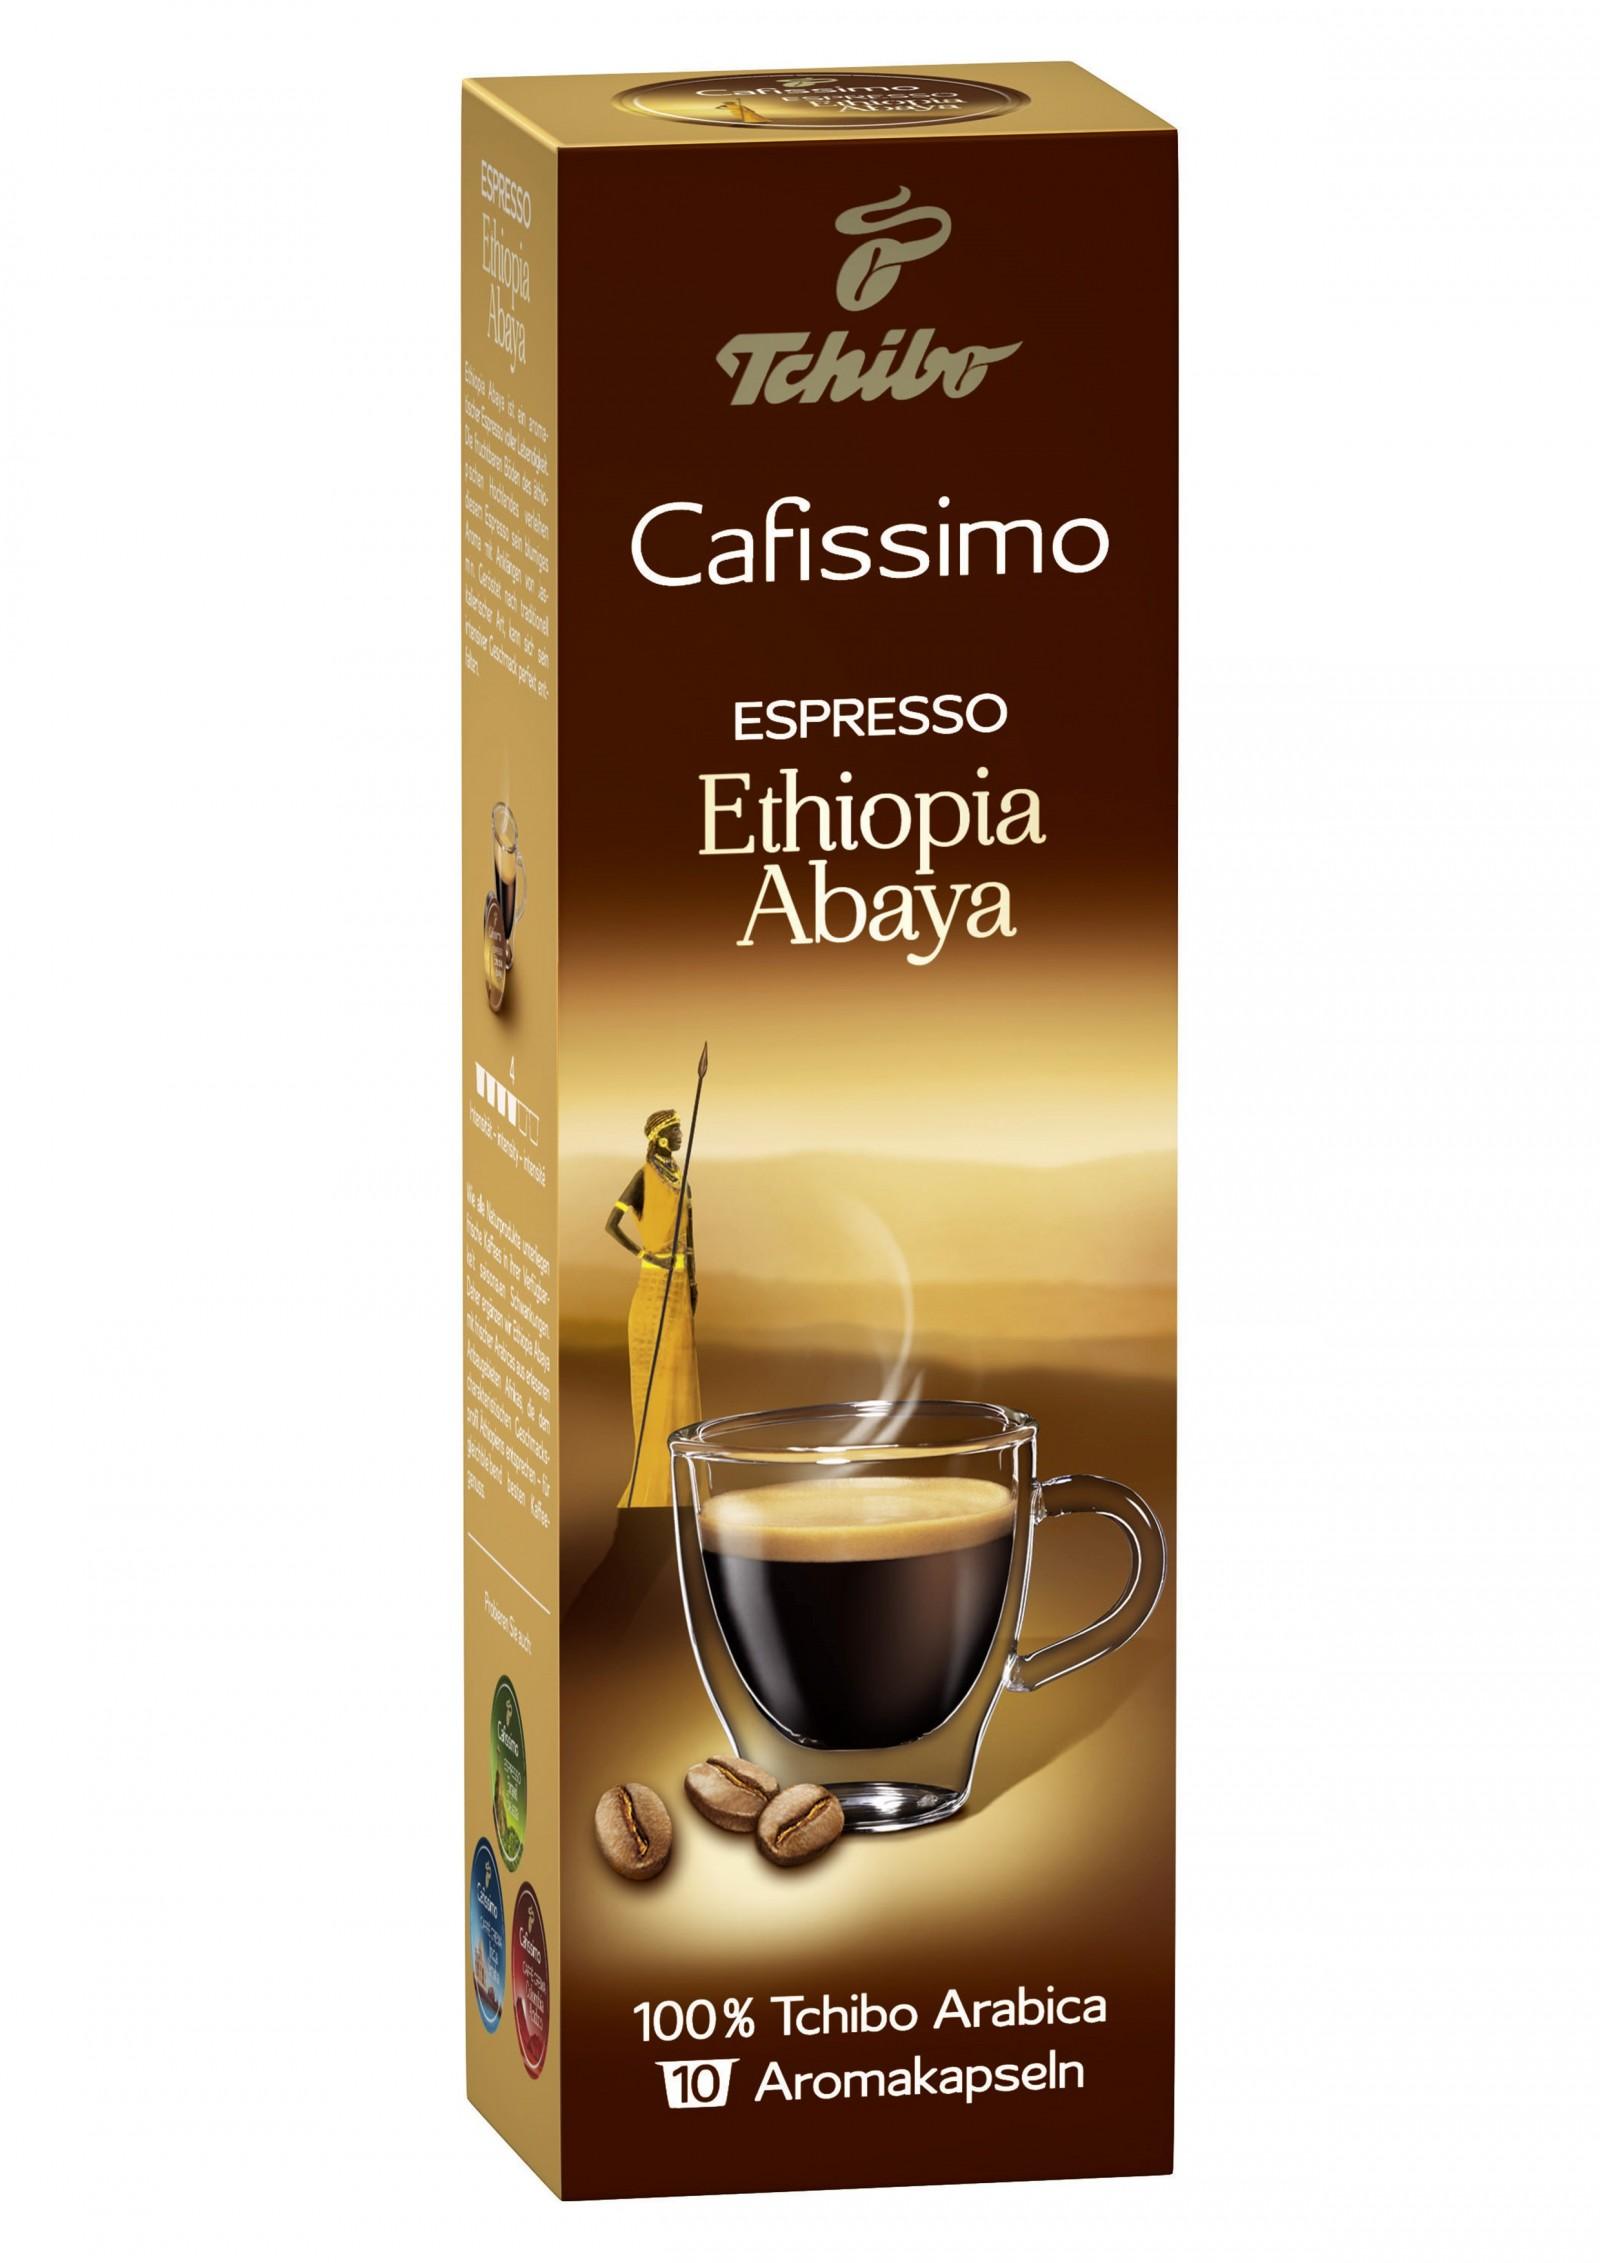 Tchibo Cafissimo Espresso Ethiopia Abaya 100% Arabica